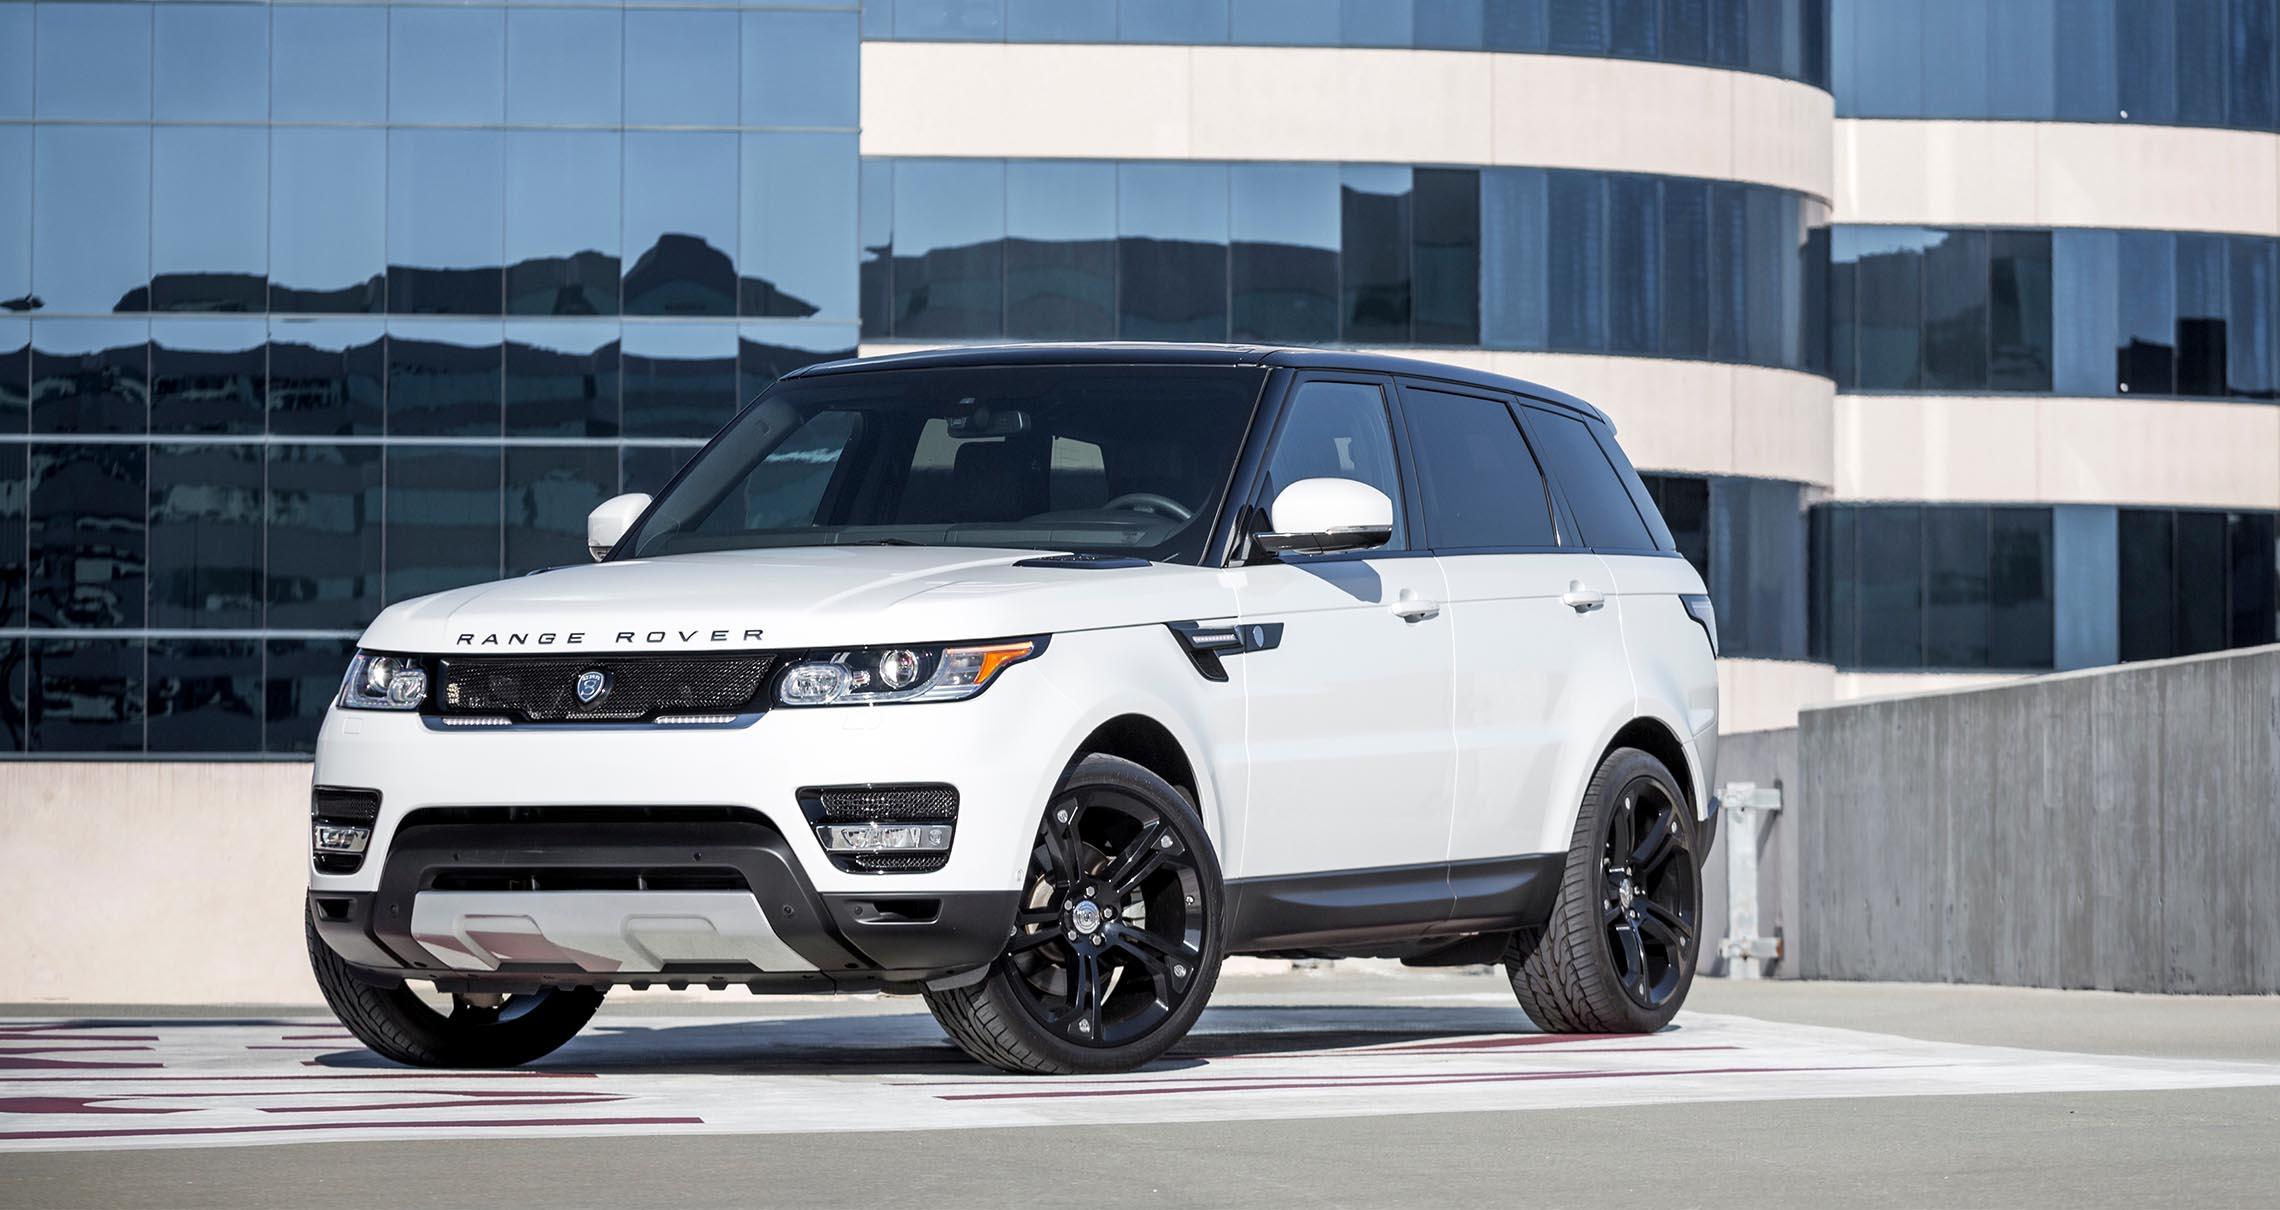 Range Rover Sport —